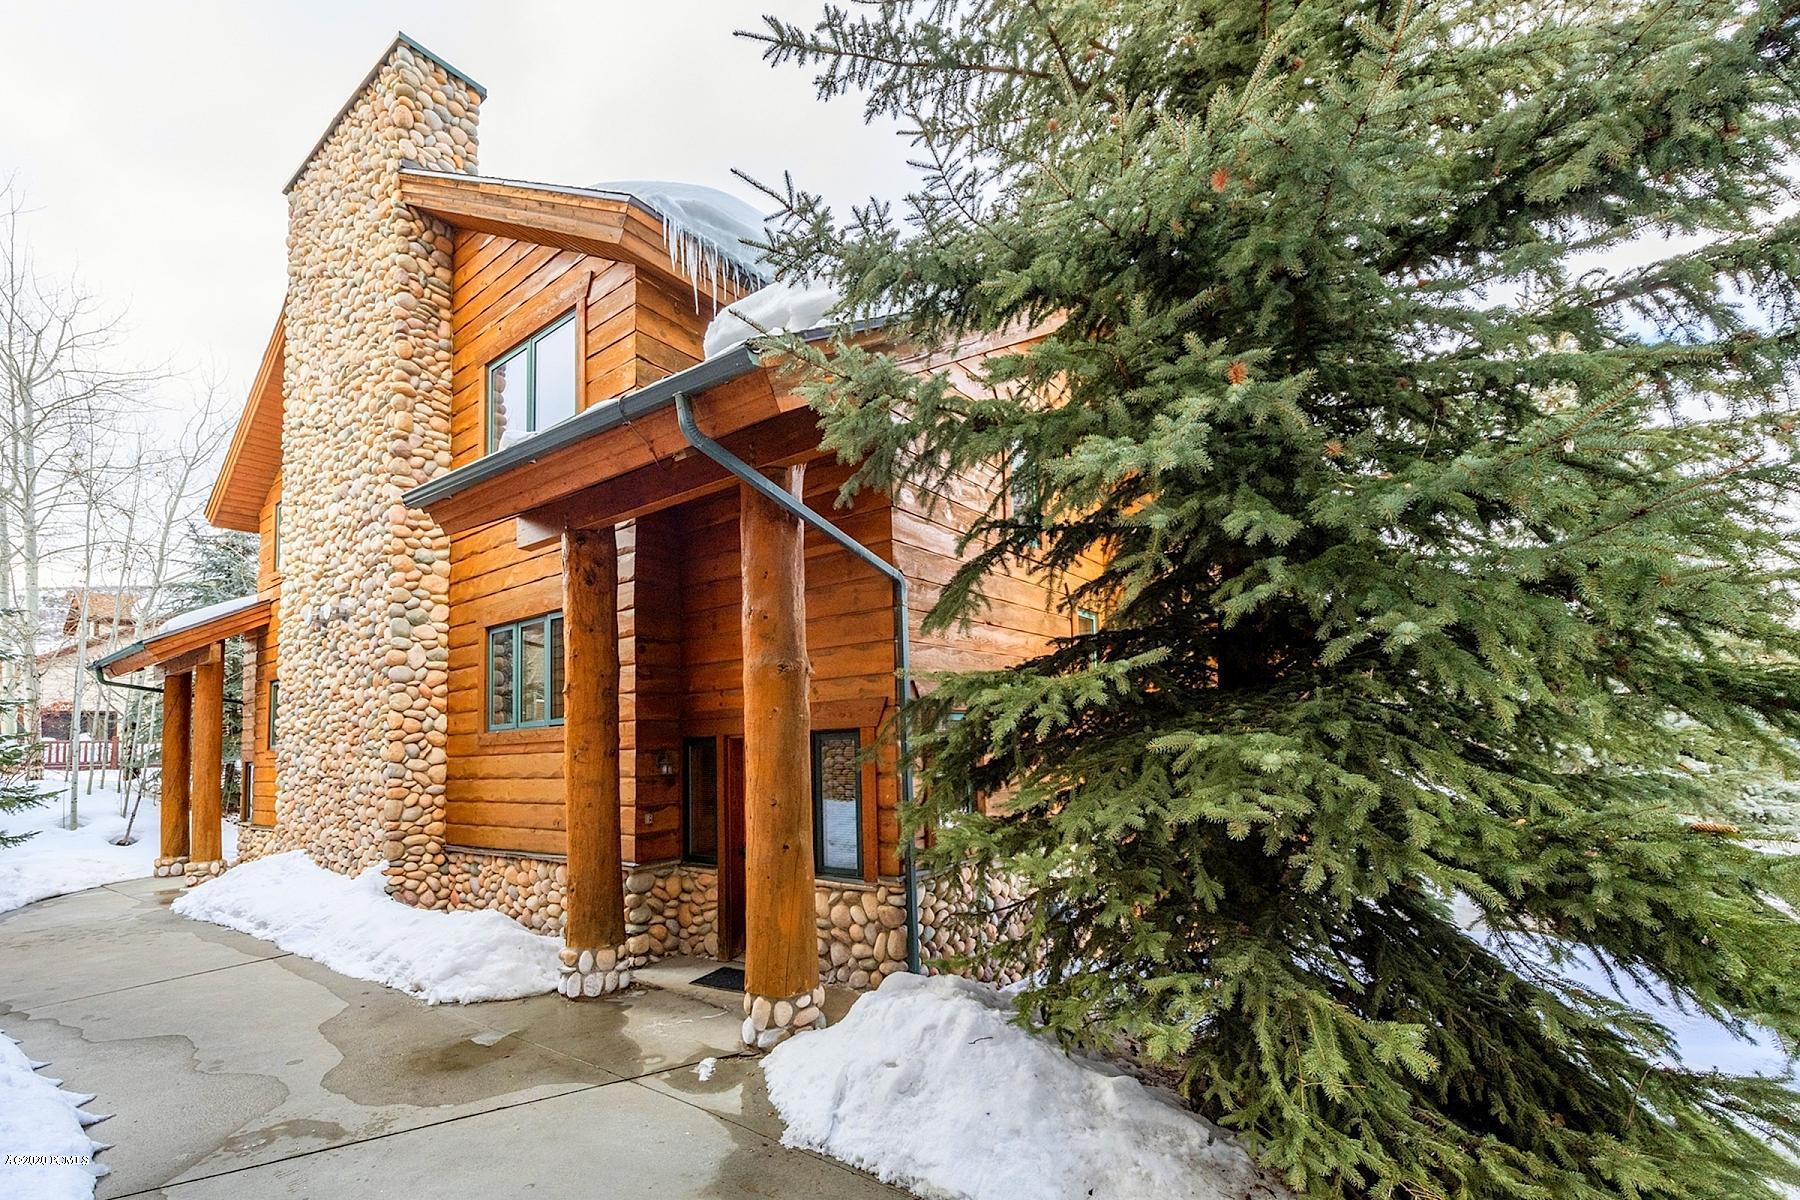 3975 Timber Wolf Lane, Park City, Utah 84098, 2 Bedrooms Bedrooms, ,3 BathroomsBathrooms,Condominium,For Sale,Timber Wolf,20190109112430415765000000